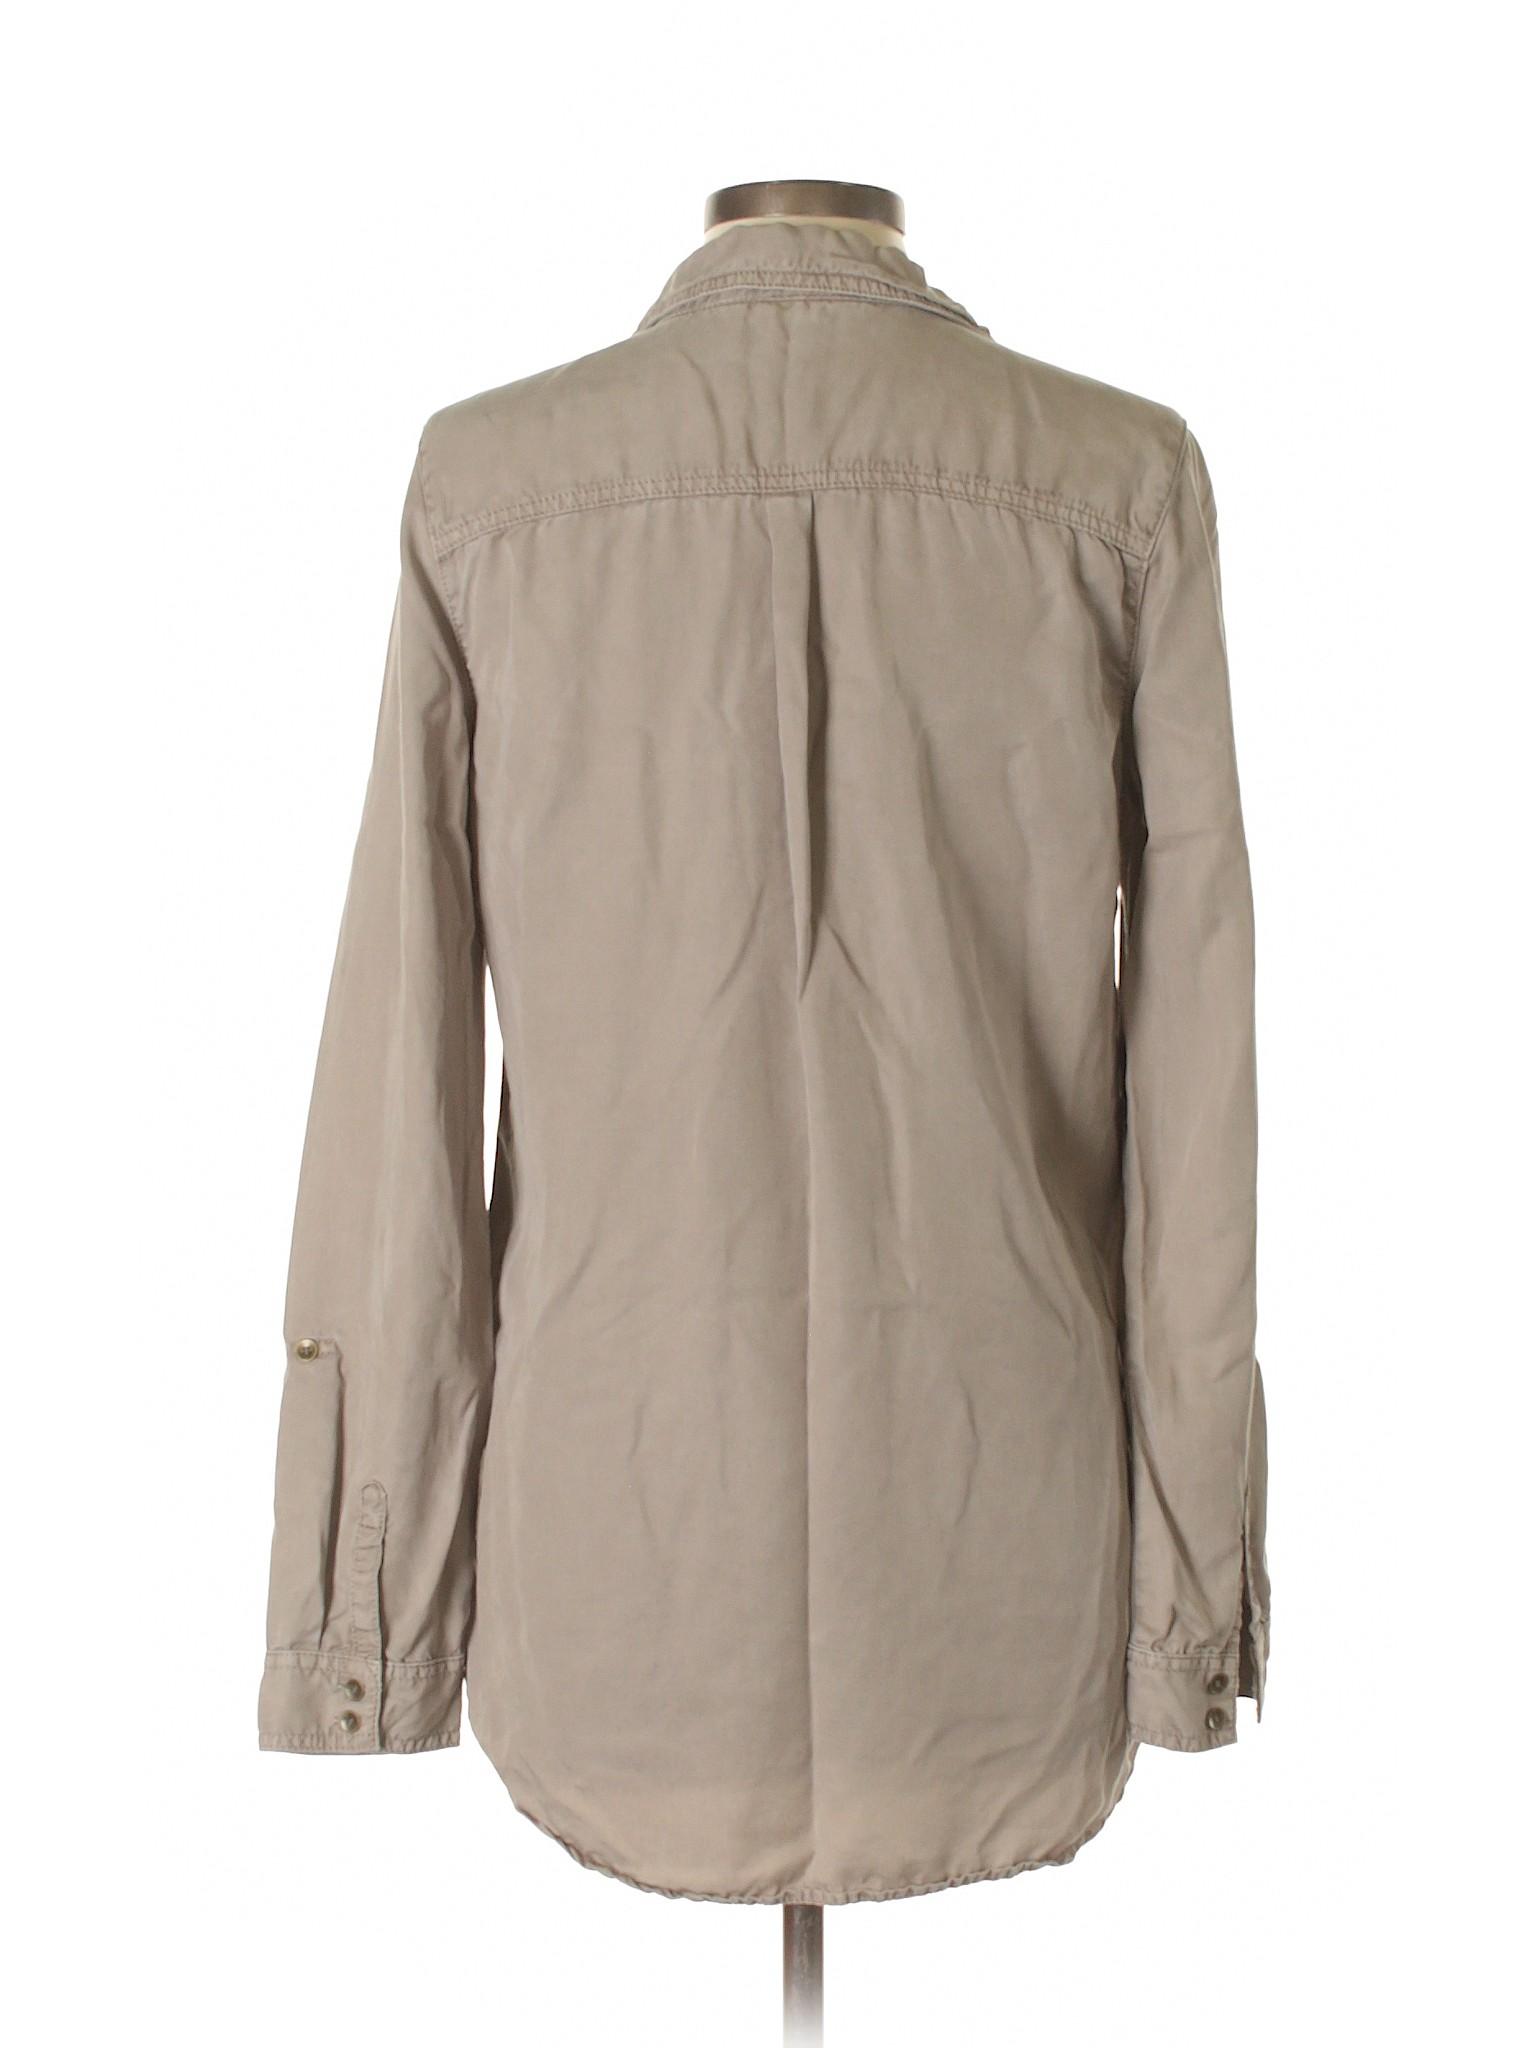 e6392e6244022 Halogen 100% Tencel Solid Tan Long Sleeve Blouse Size L - 74% off ...